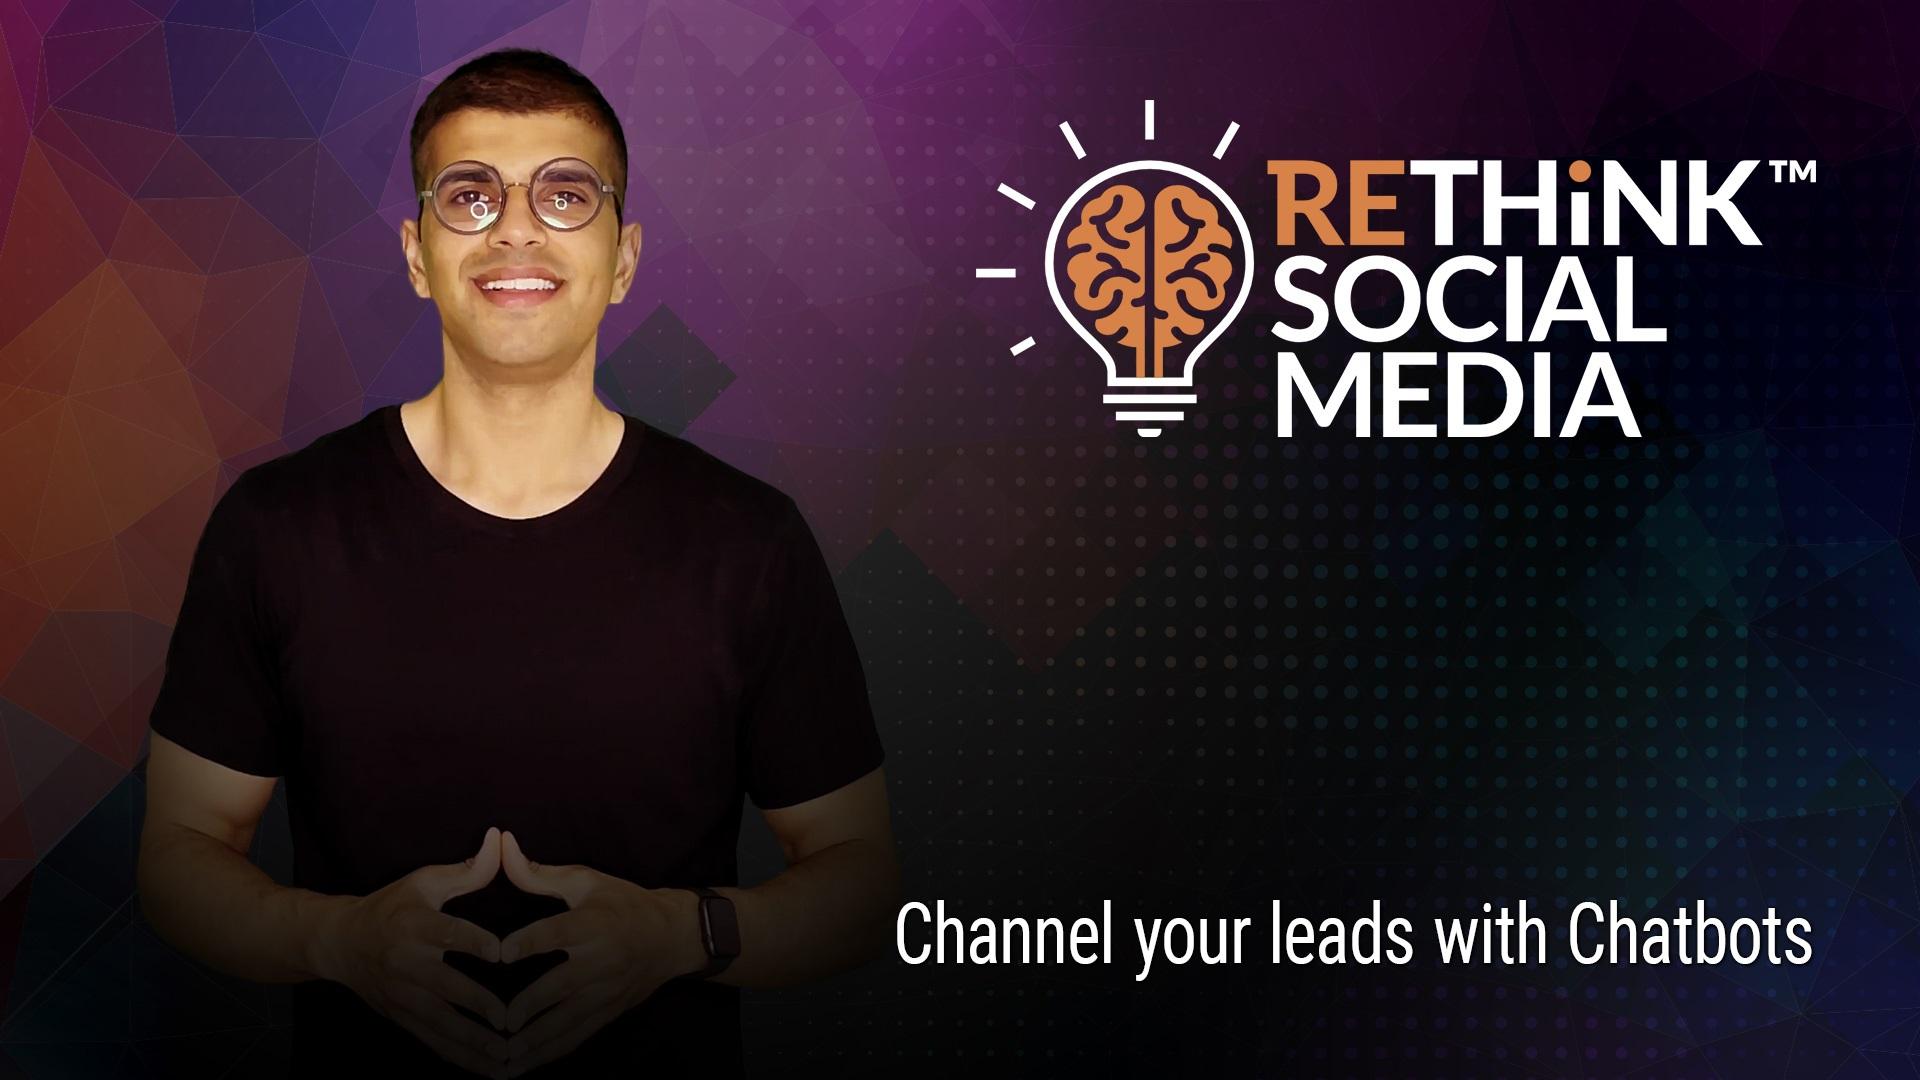 Episode 20 - Chatbots with Vishal Patel